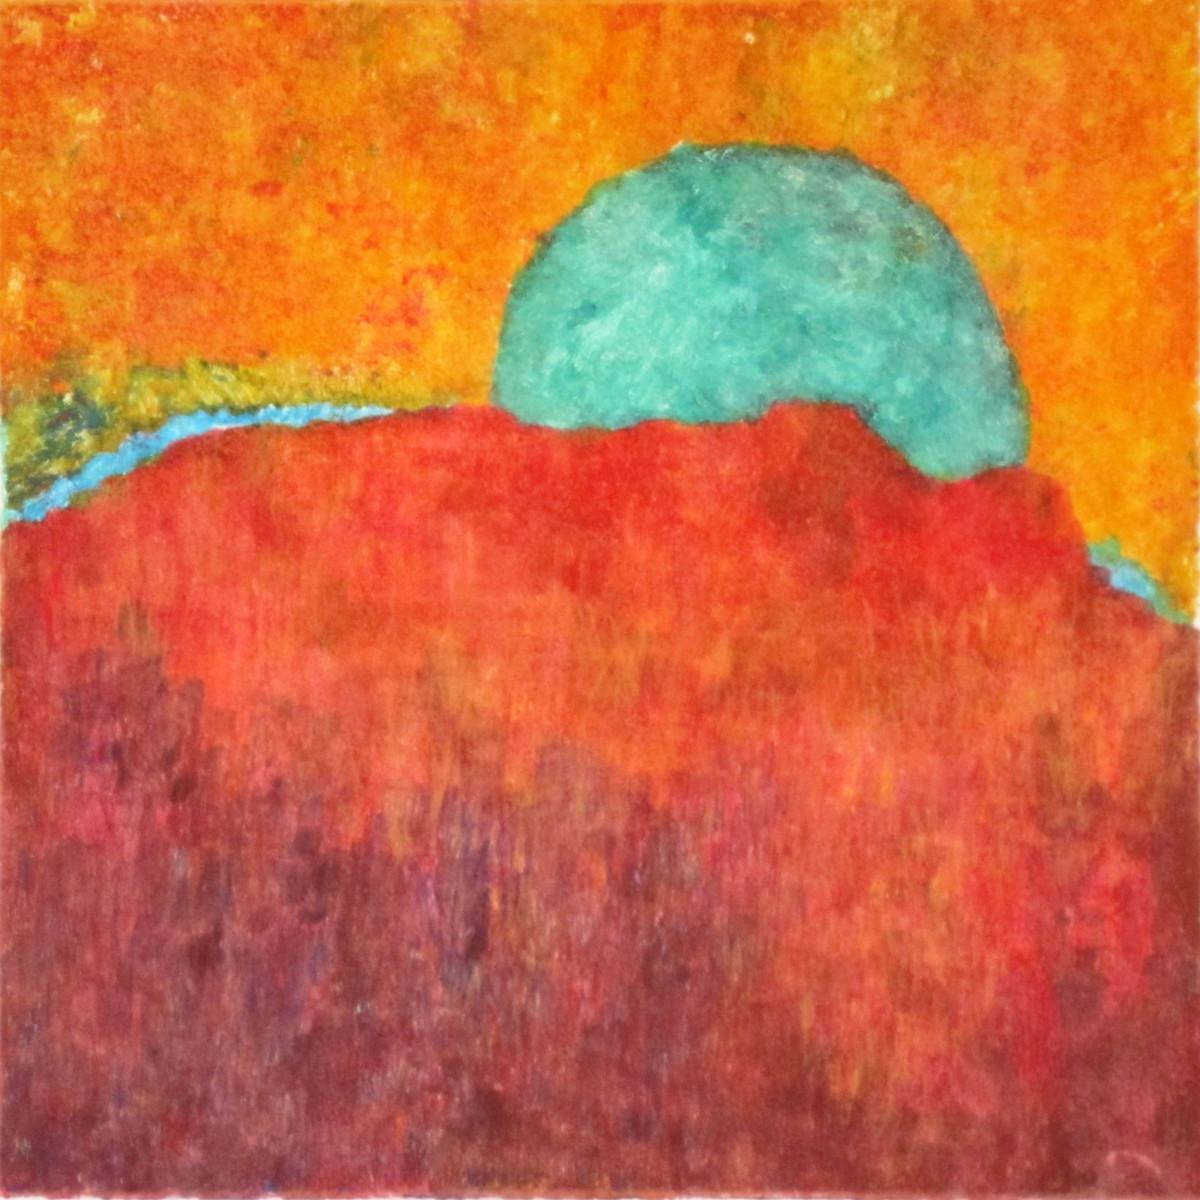 Maria Hughes. My Sun, My Landscape, Monotype, 15 x 15 in.